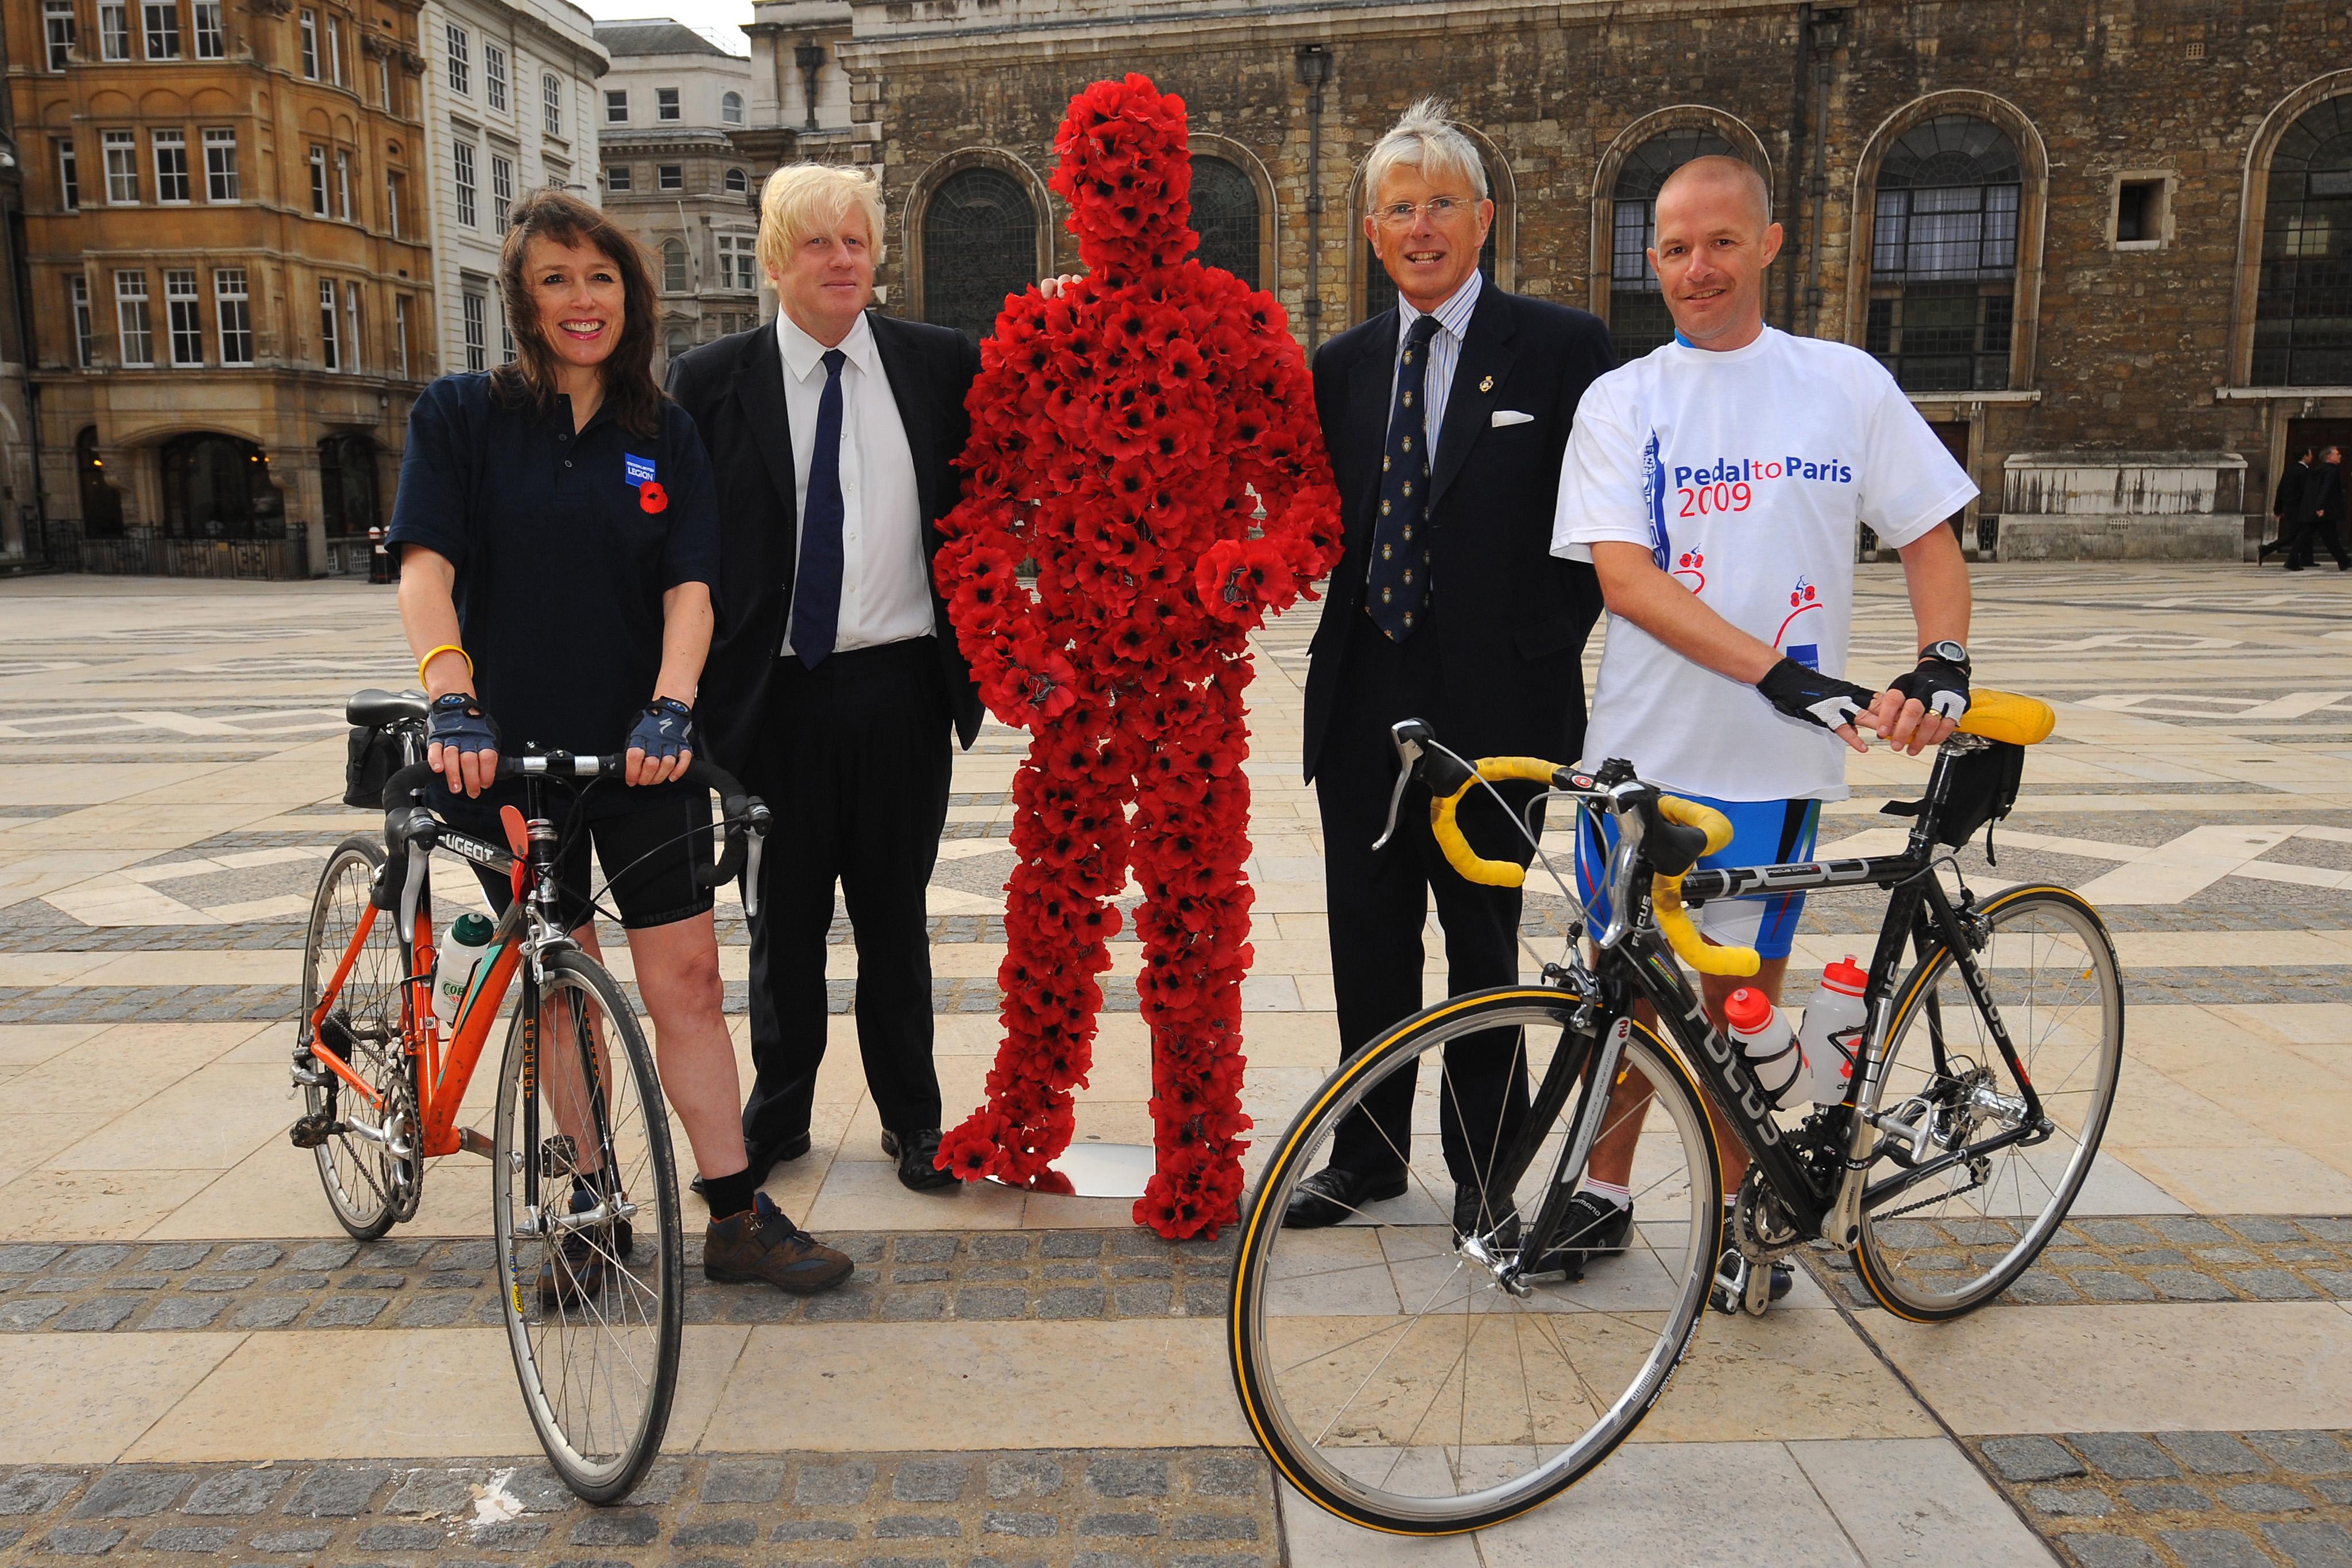 The Mayor of London, Boris Johnson celebrates the start of the Royal British Legion's Pedal to Paris ride 2009 in London.